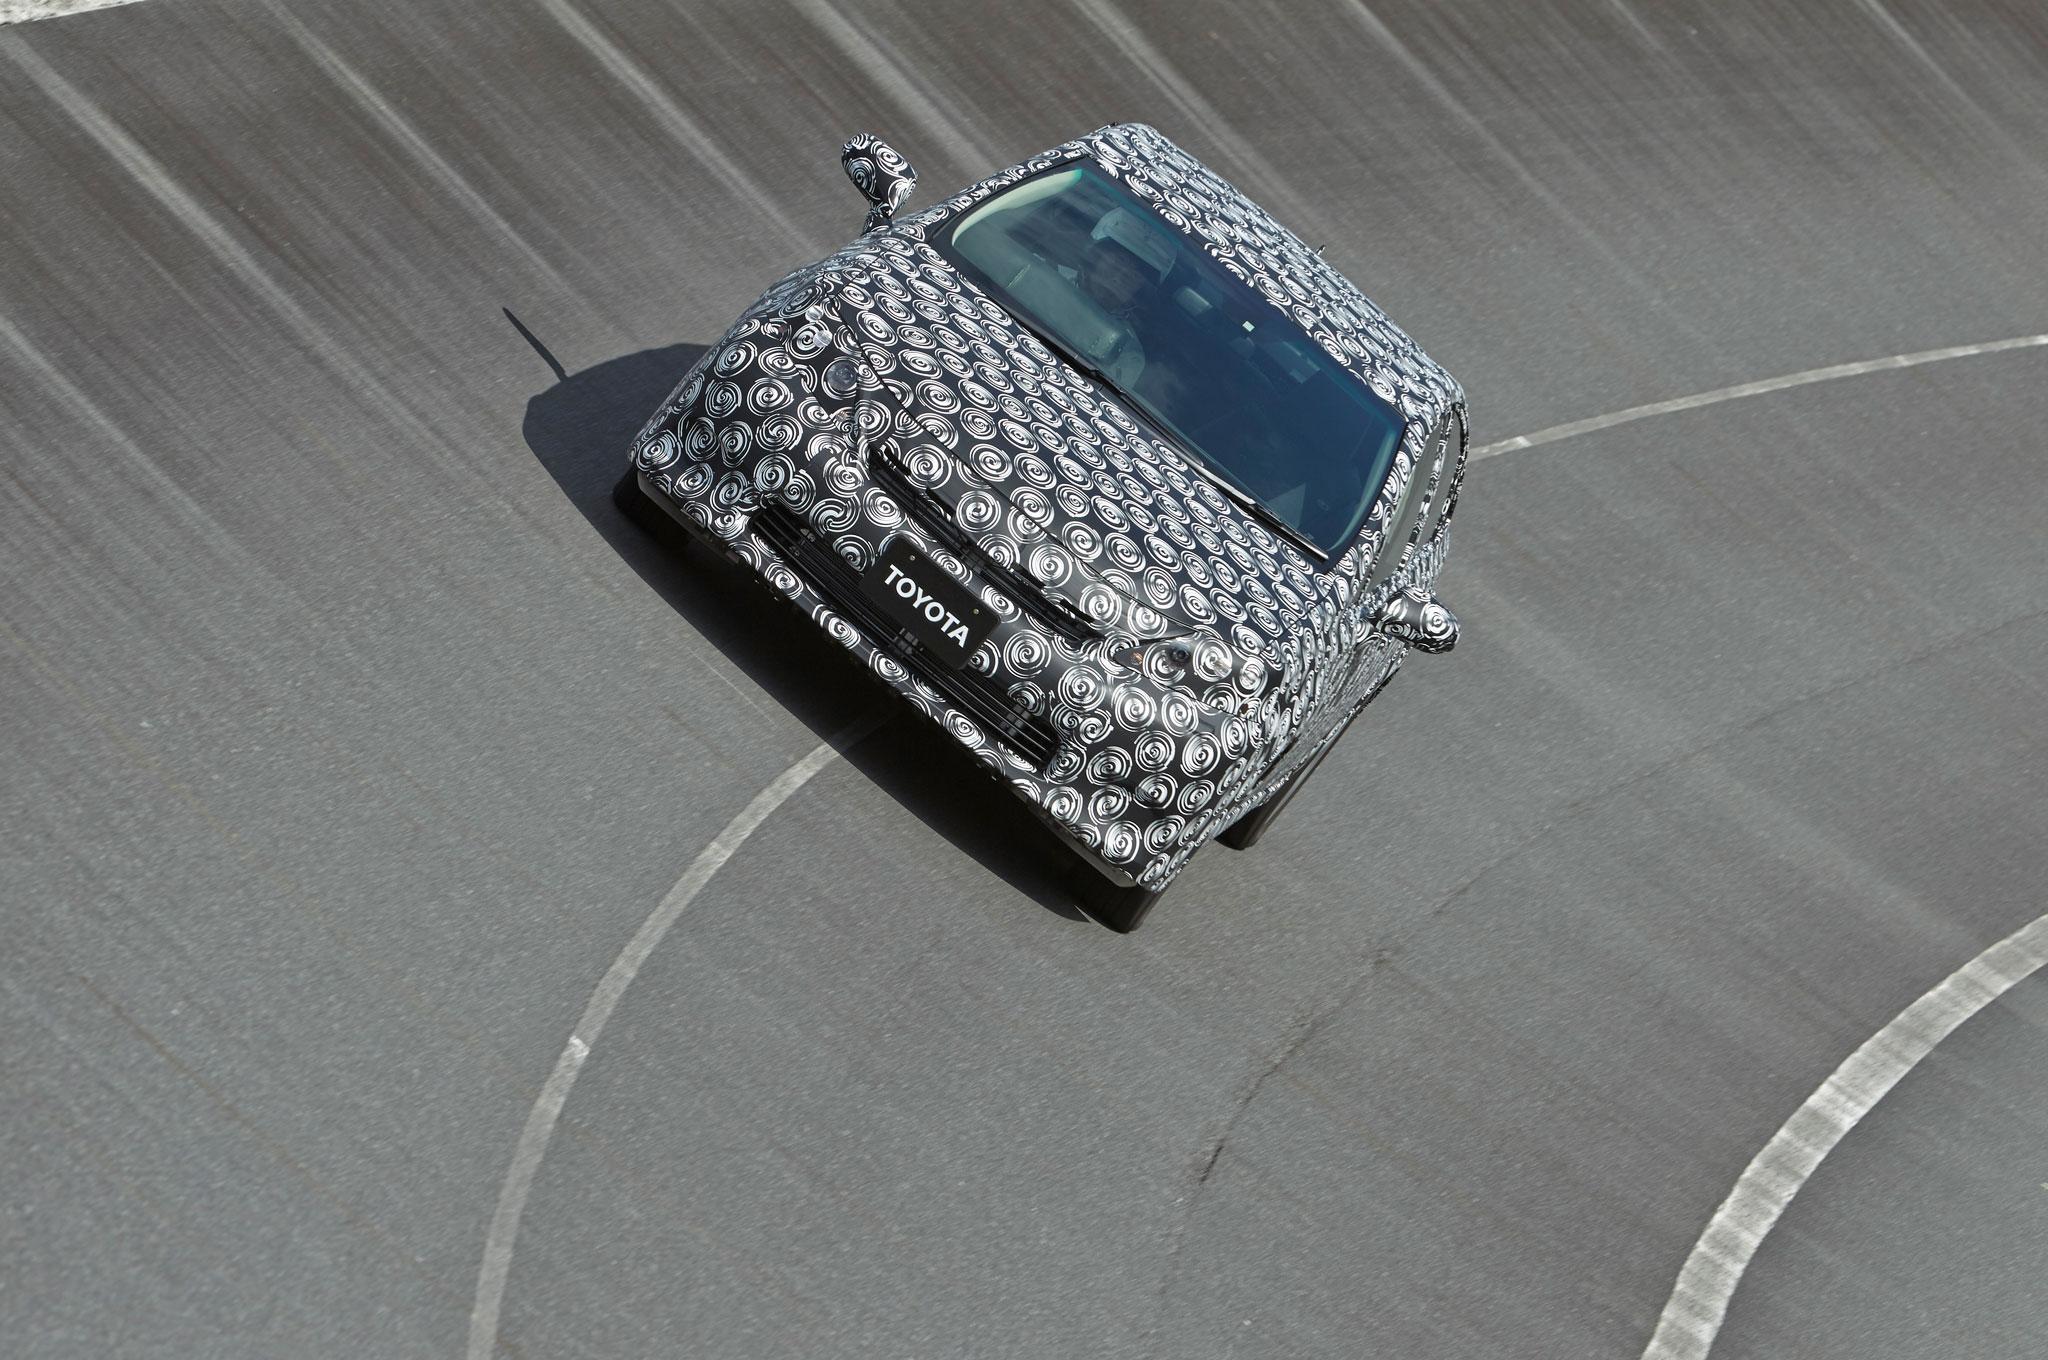 2015 Toyota Hydrogen Sedan Prototype Front View 21